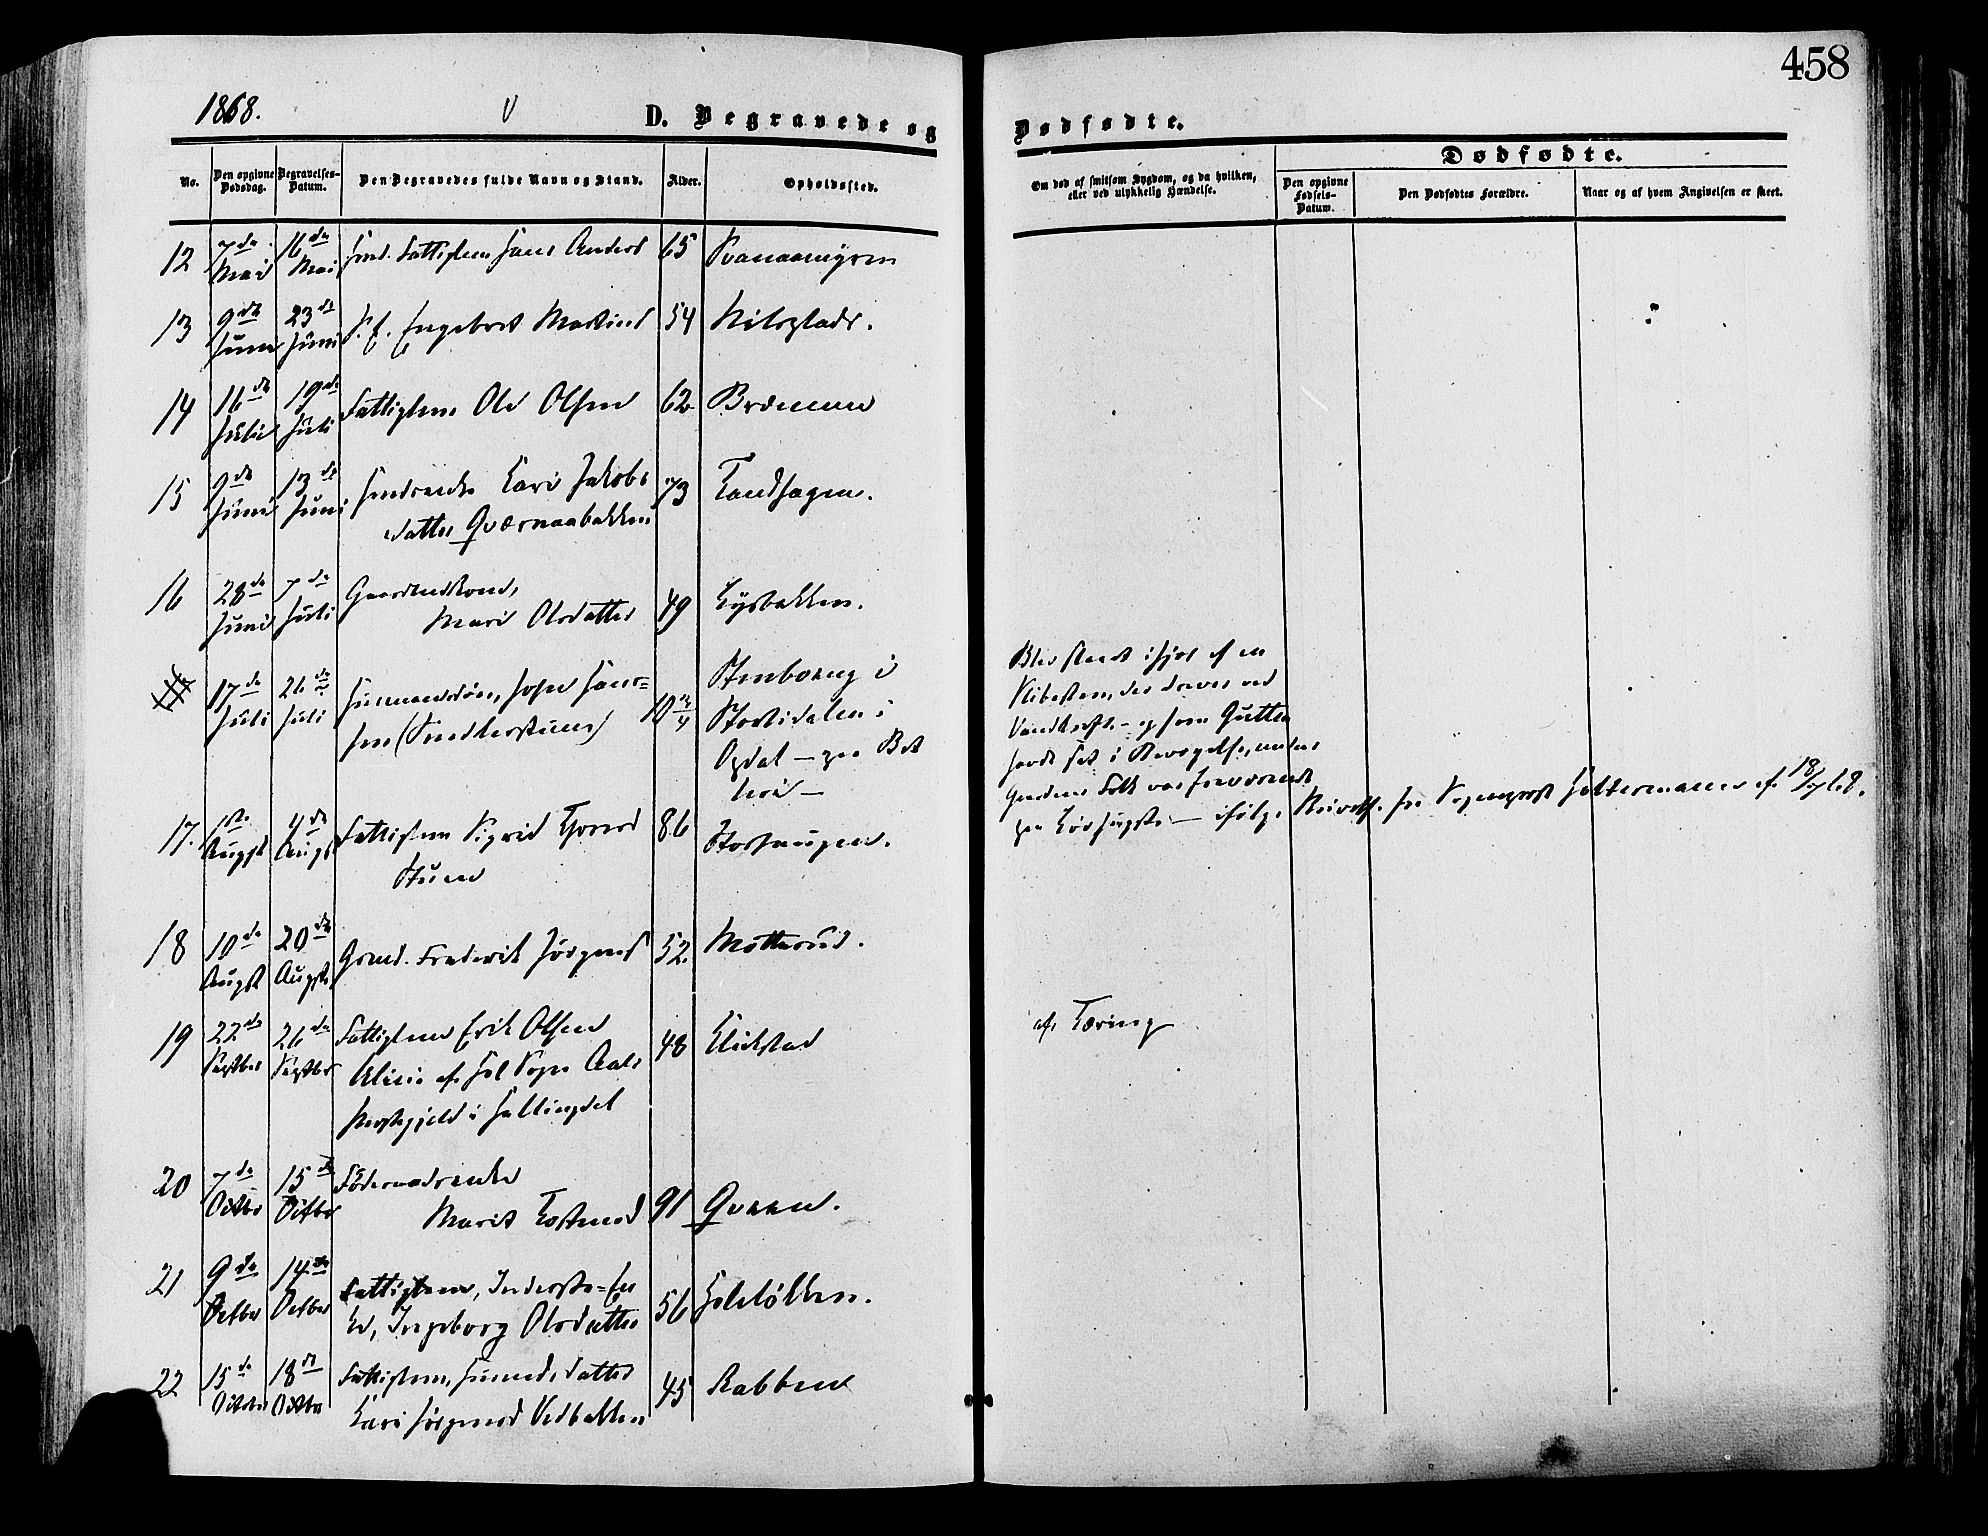 SAH, Lesja prestekontor, Ministerialbok nr. 8, 1854-1880, s. 458